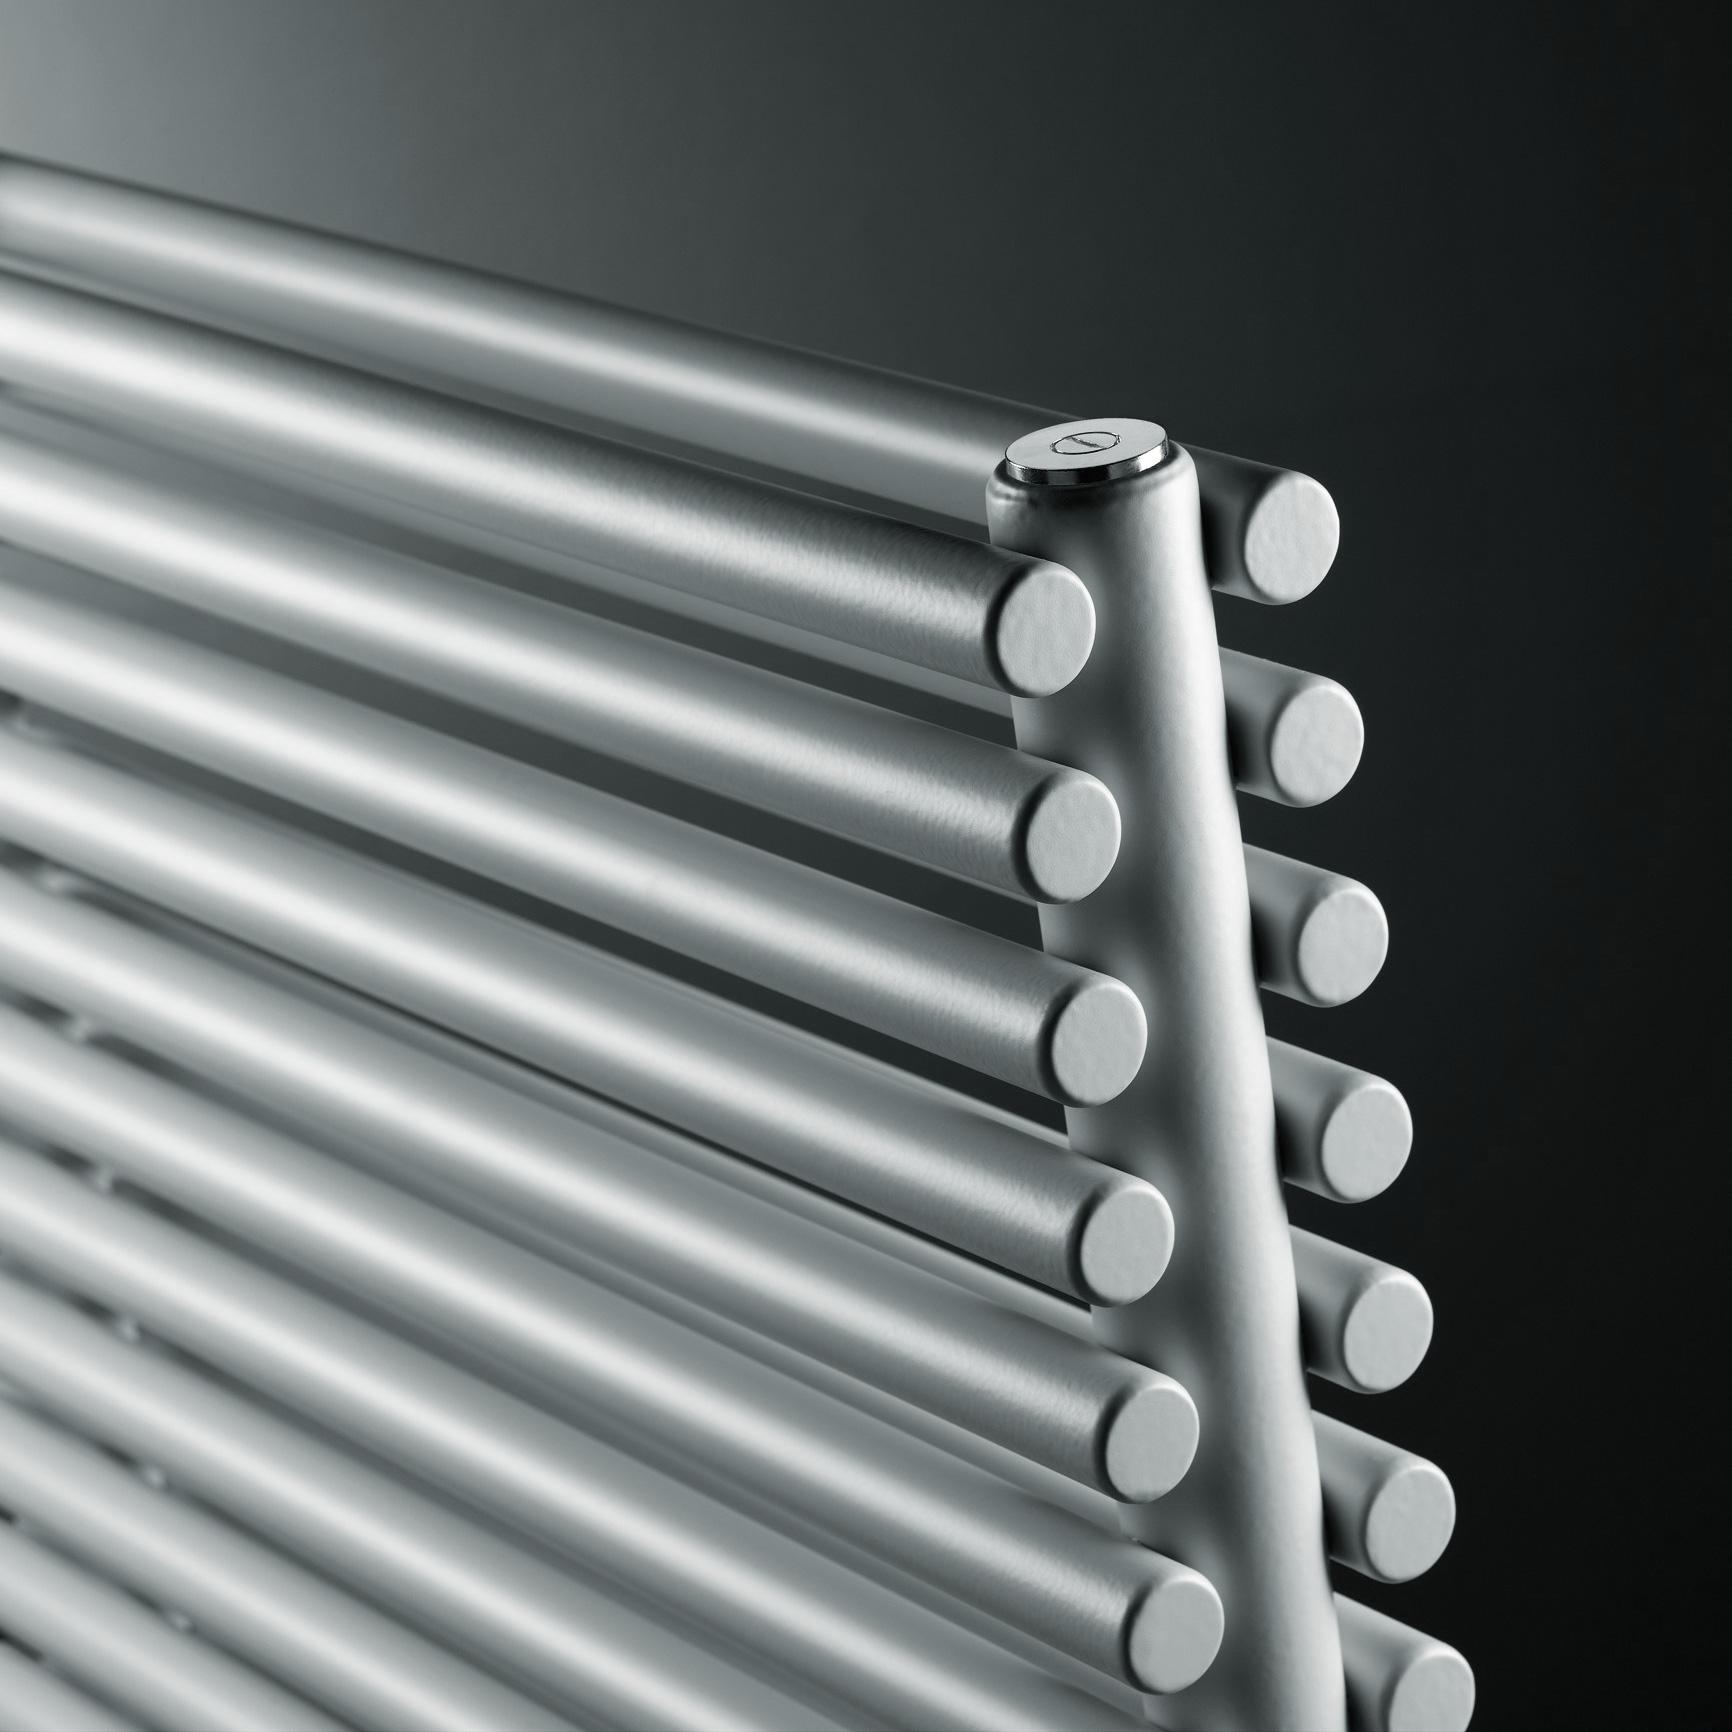 vasco agave hr2 heizk rper zweireihig breite 50 cm 883 watt 111770500111400189016 0000. Black Bedroom Furniture Sets. Home Design Ideas